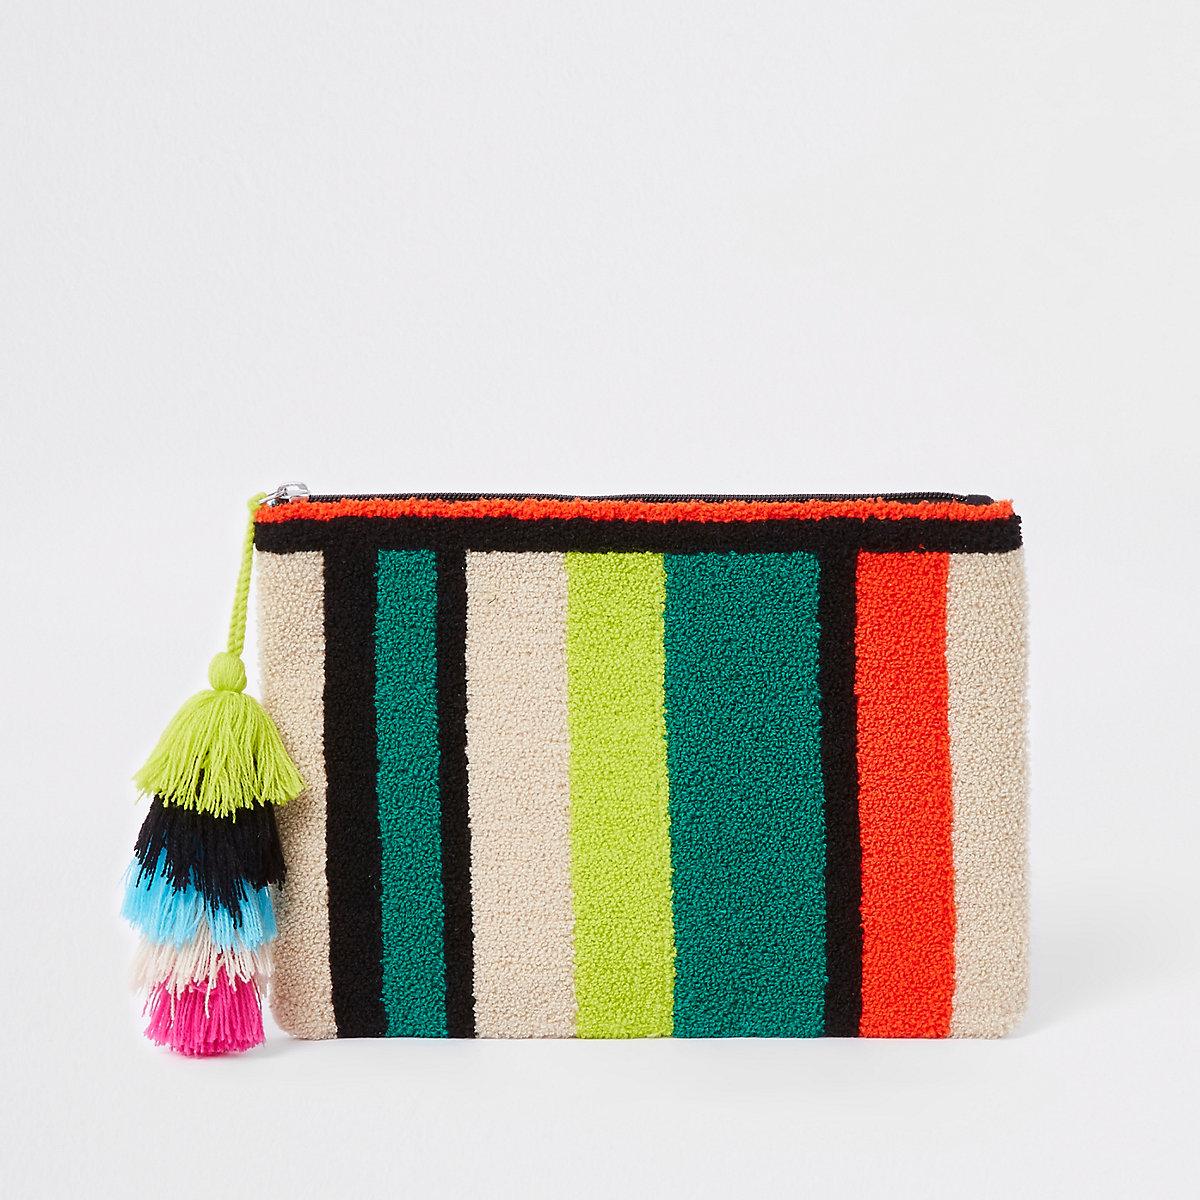 Green stripe tassel suede pouch clutch bag